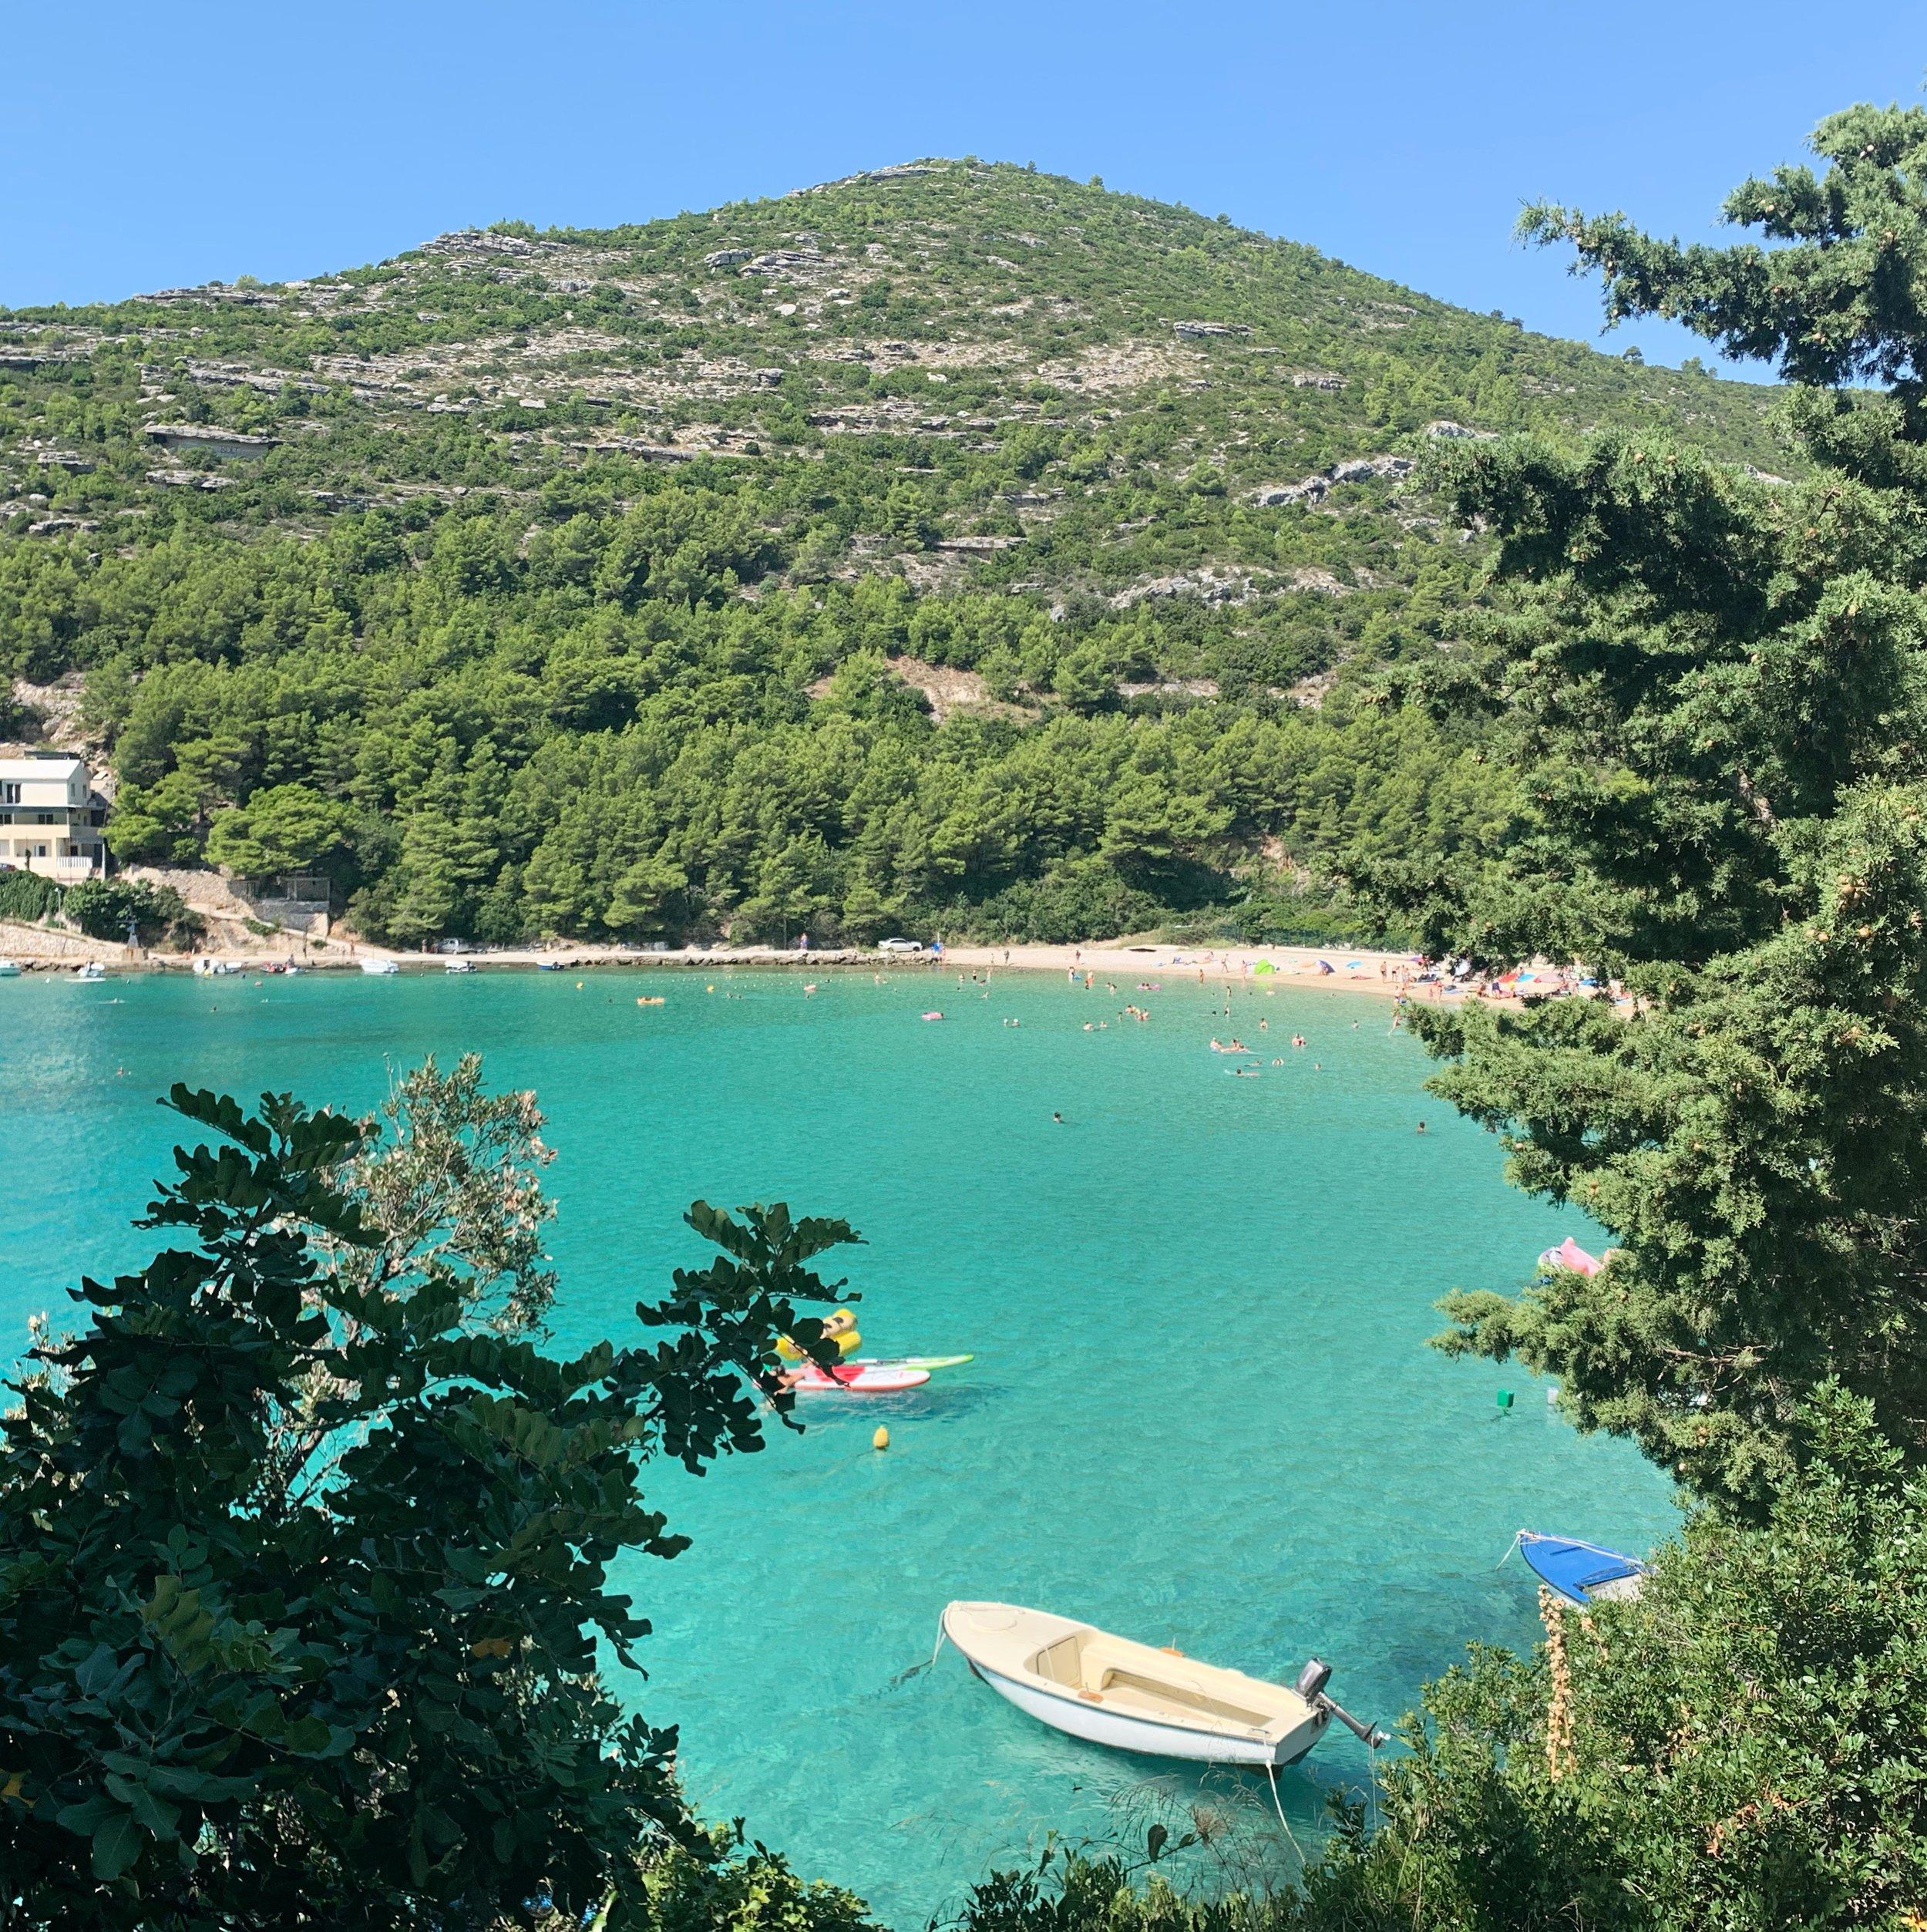 Prapratno Beach, Peljesac Peninsula, Croatia